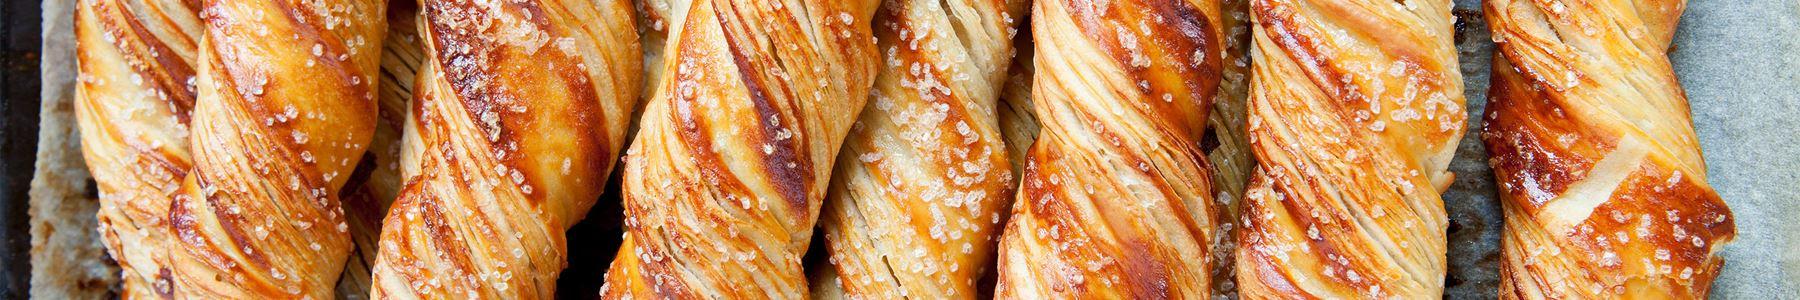 Sødt brød + Fryseegnet